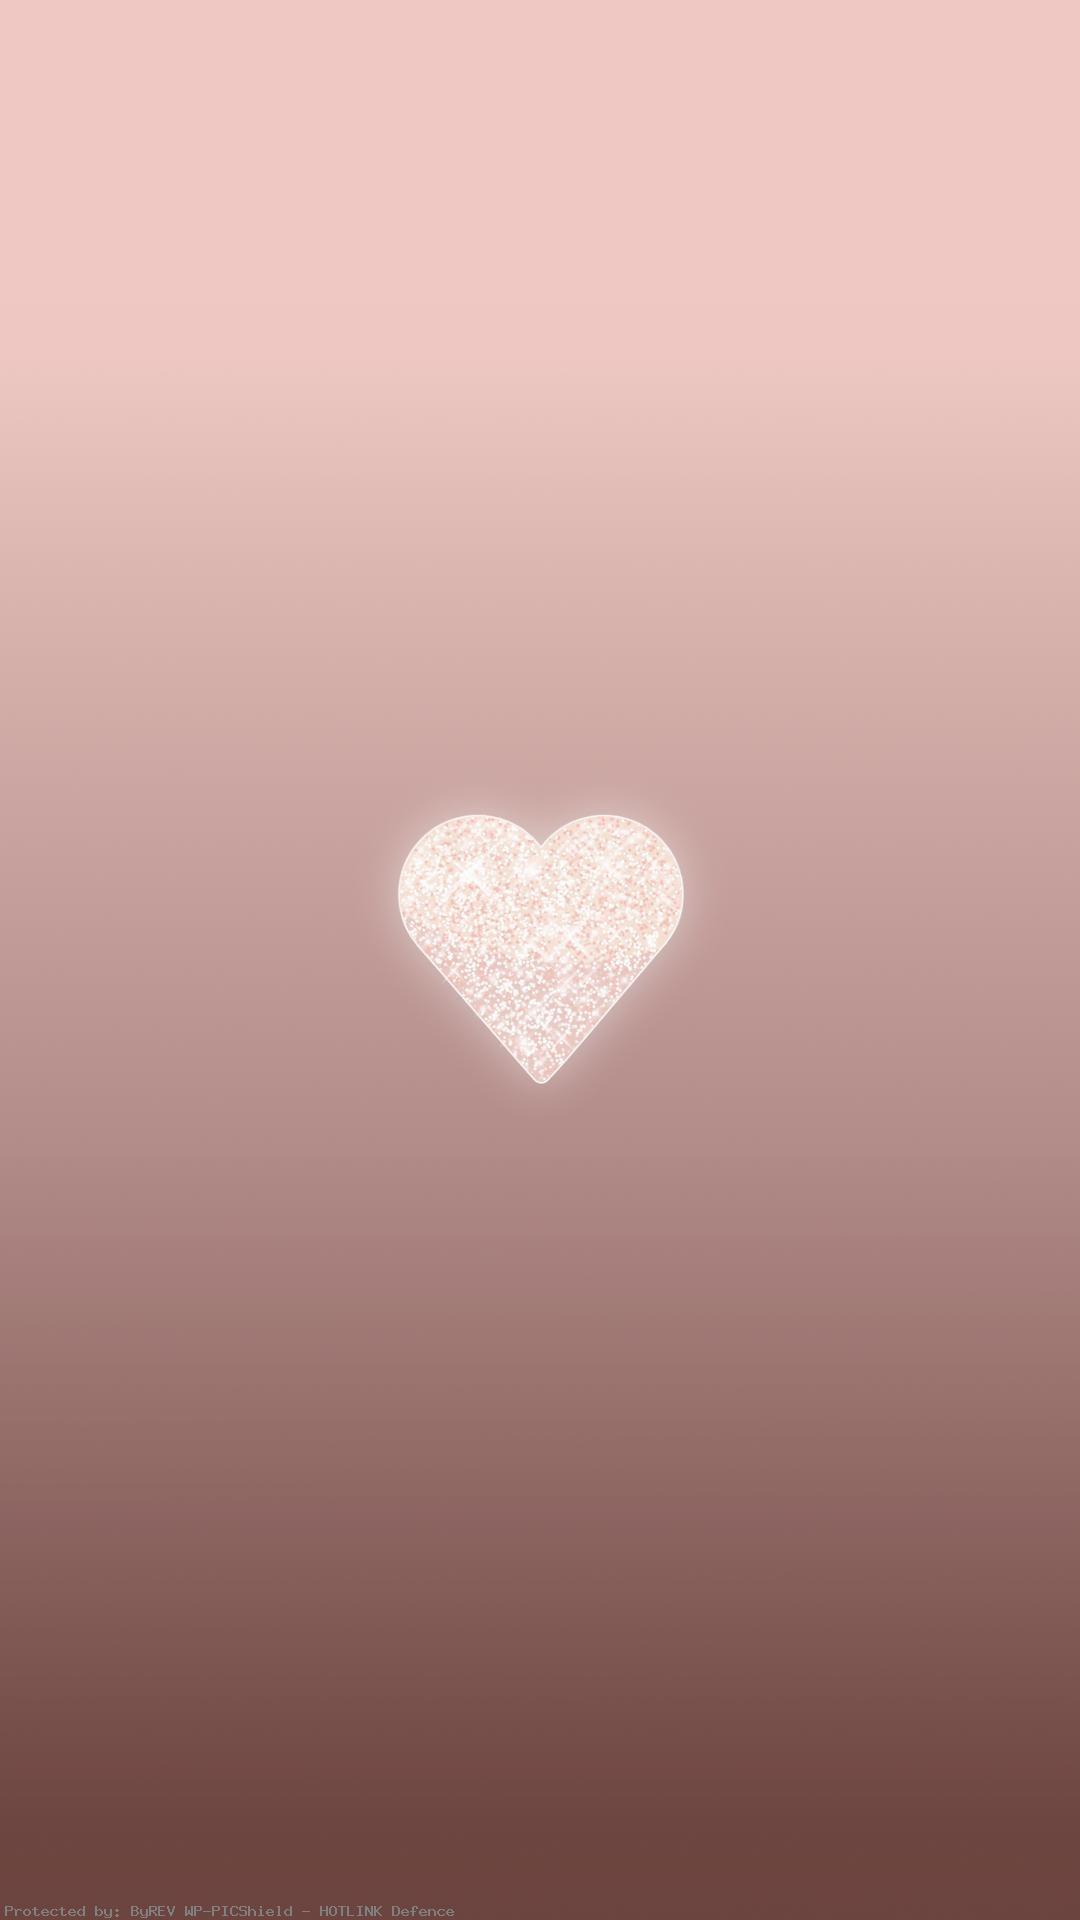 Rose-Gold-Heart-phone-background-lock-screen-wallpaper-